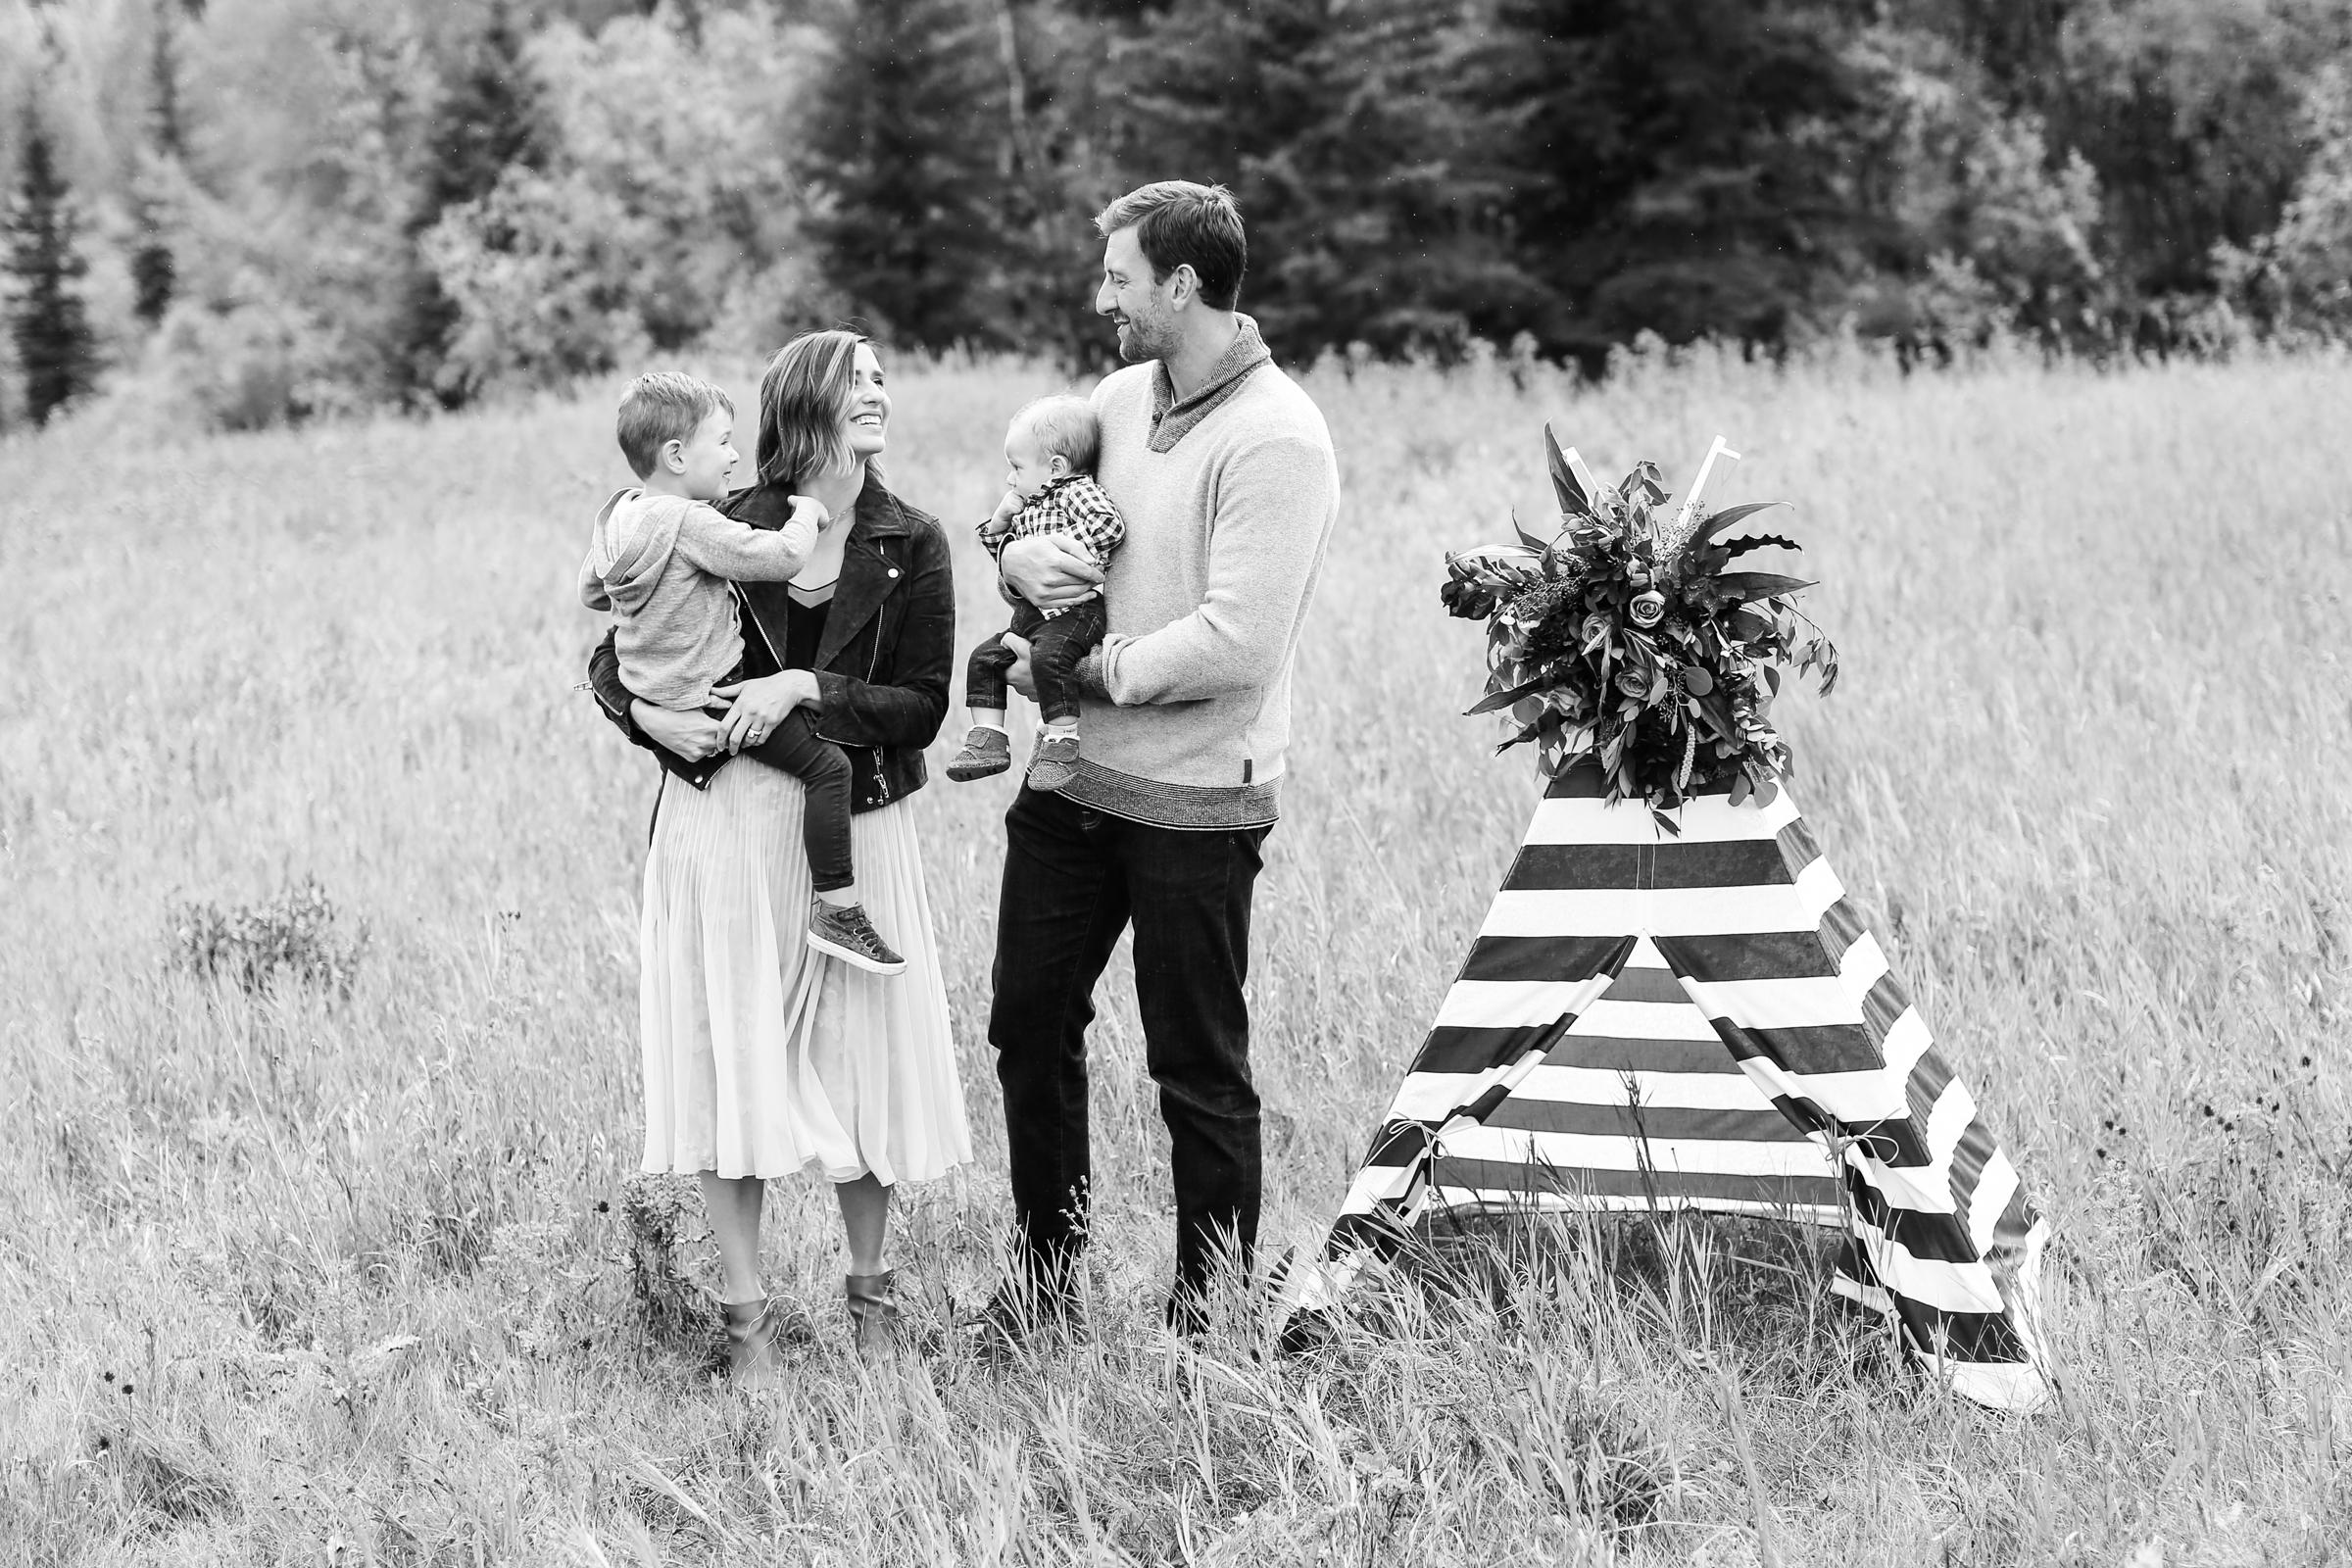 Fall-Family-Creative-Lindsay_Skeans_Photography-11.jpg